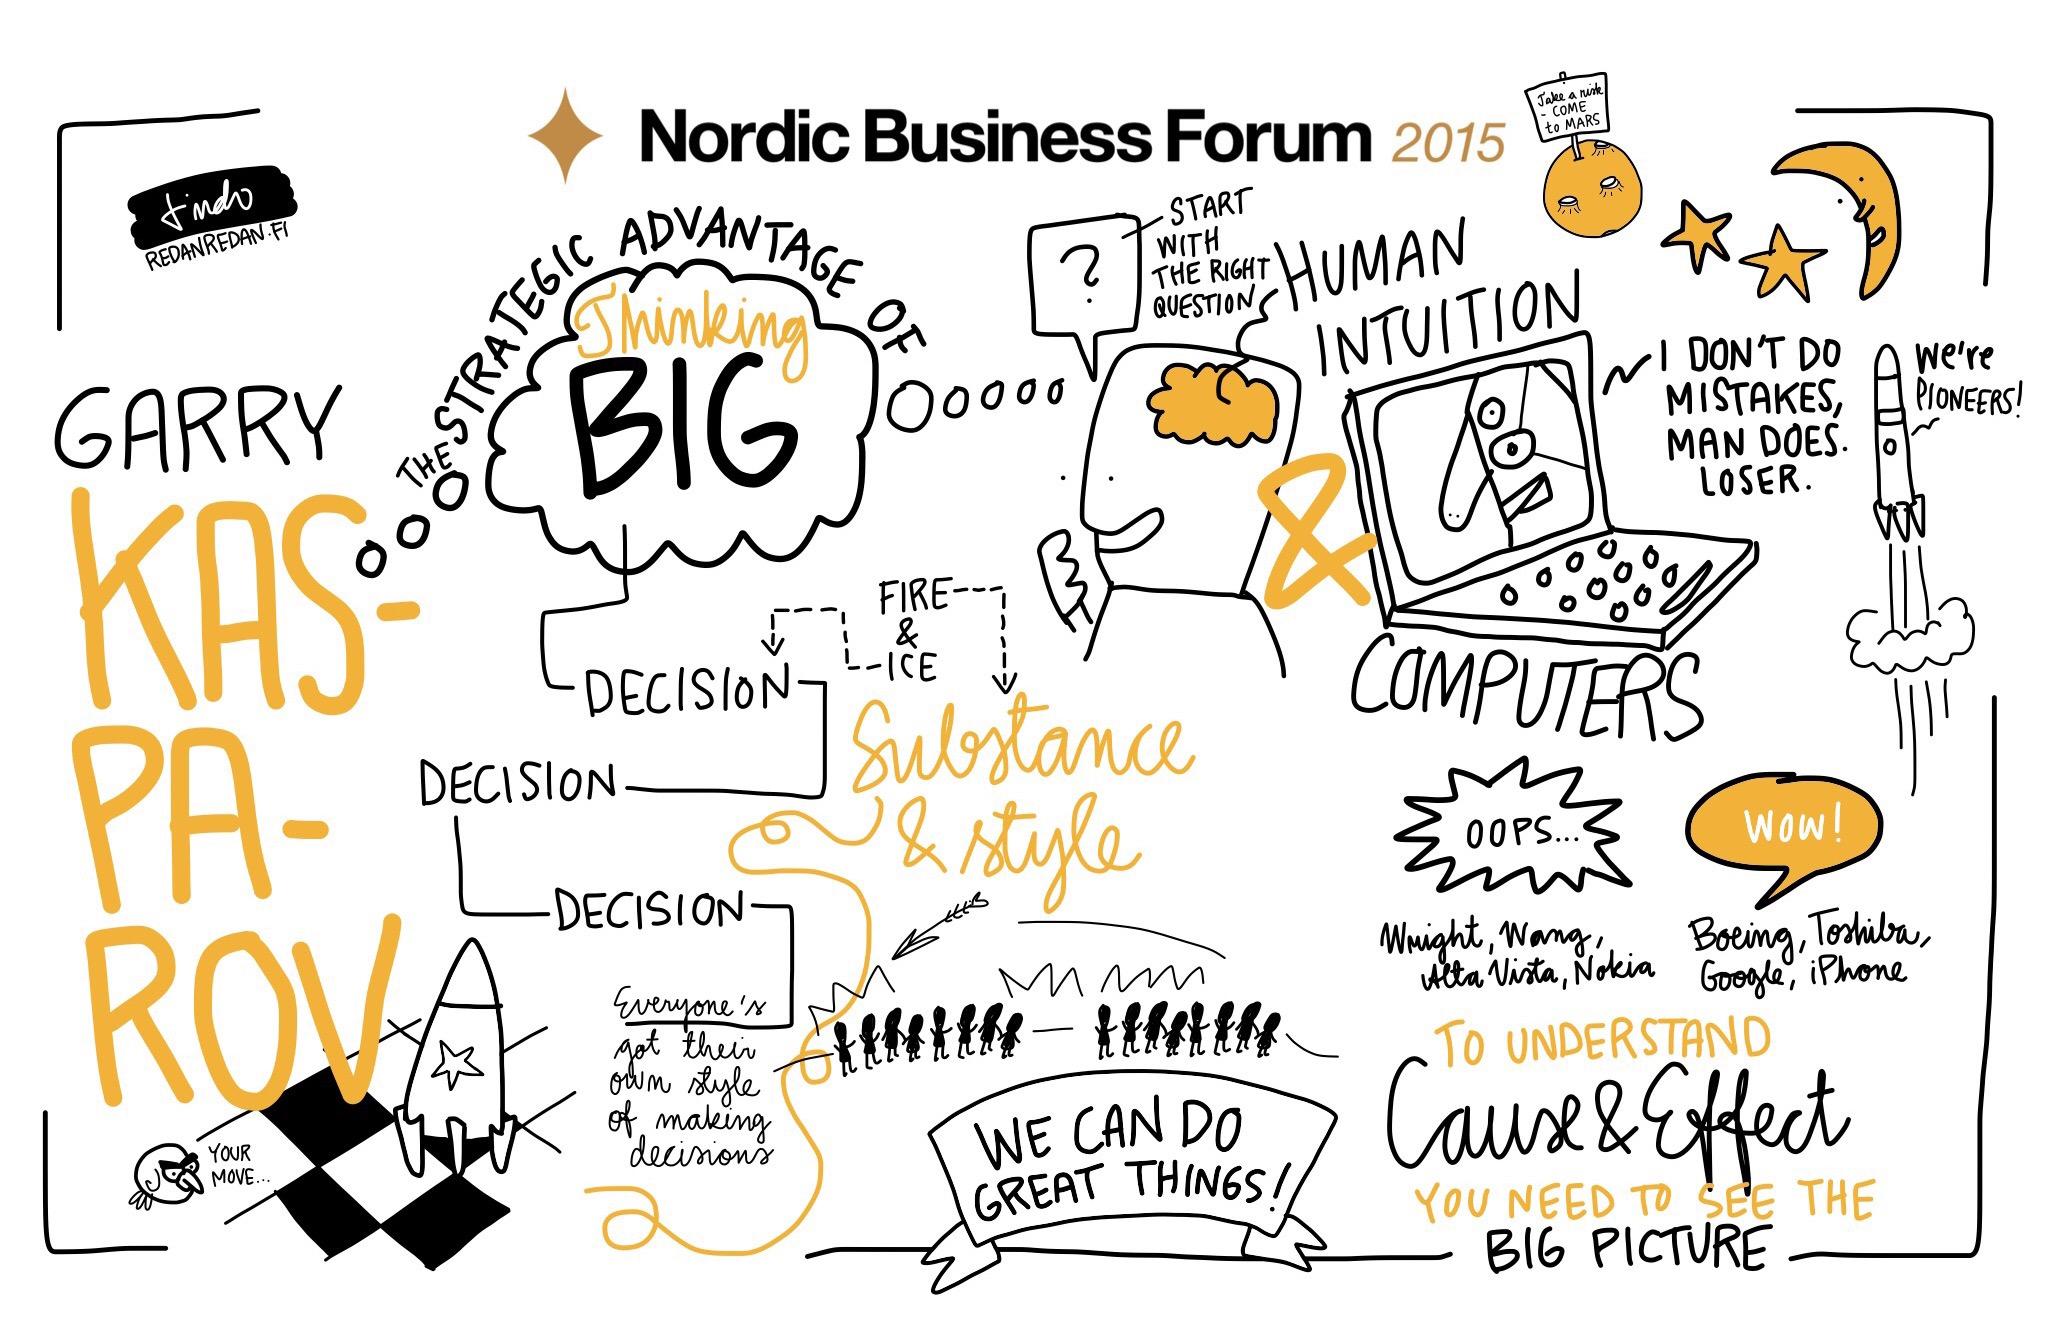 Garry Kasparov Strategy - Nordic Business Forum 2015 - Fahmidam.net